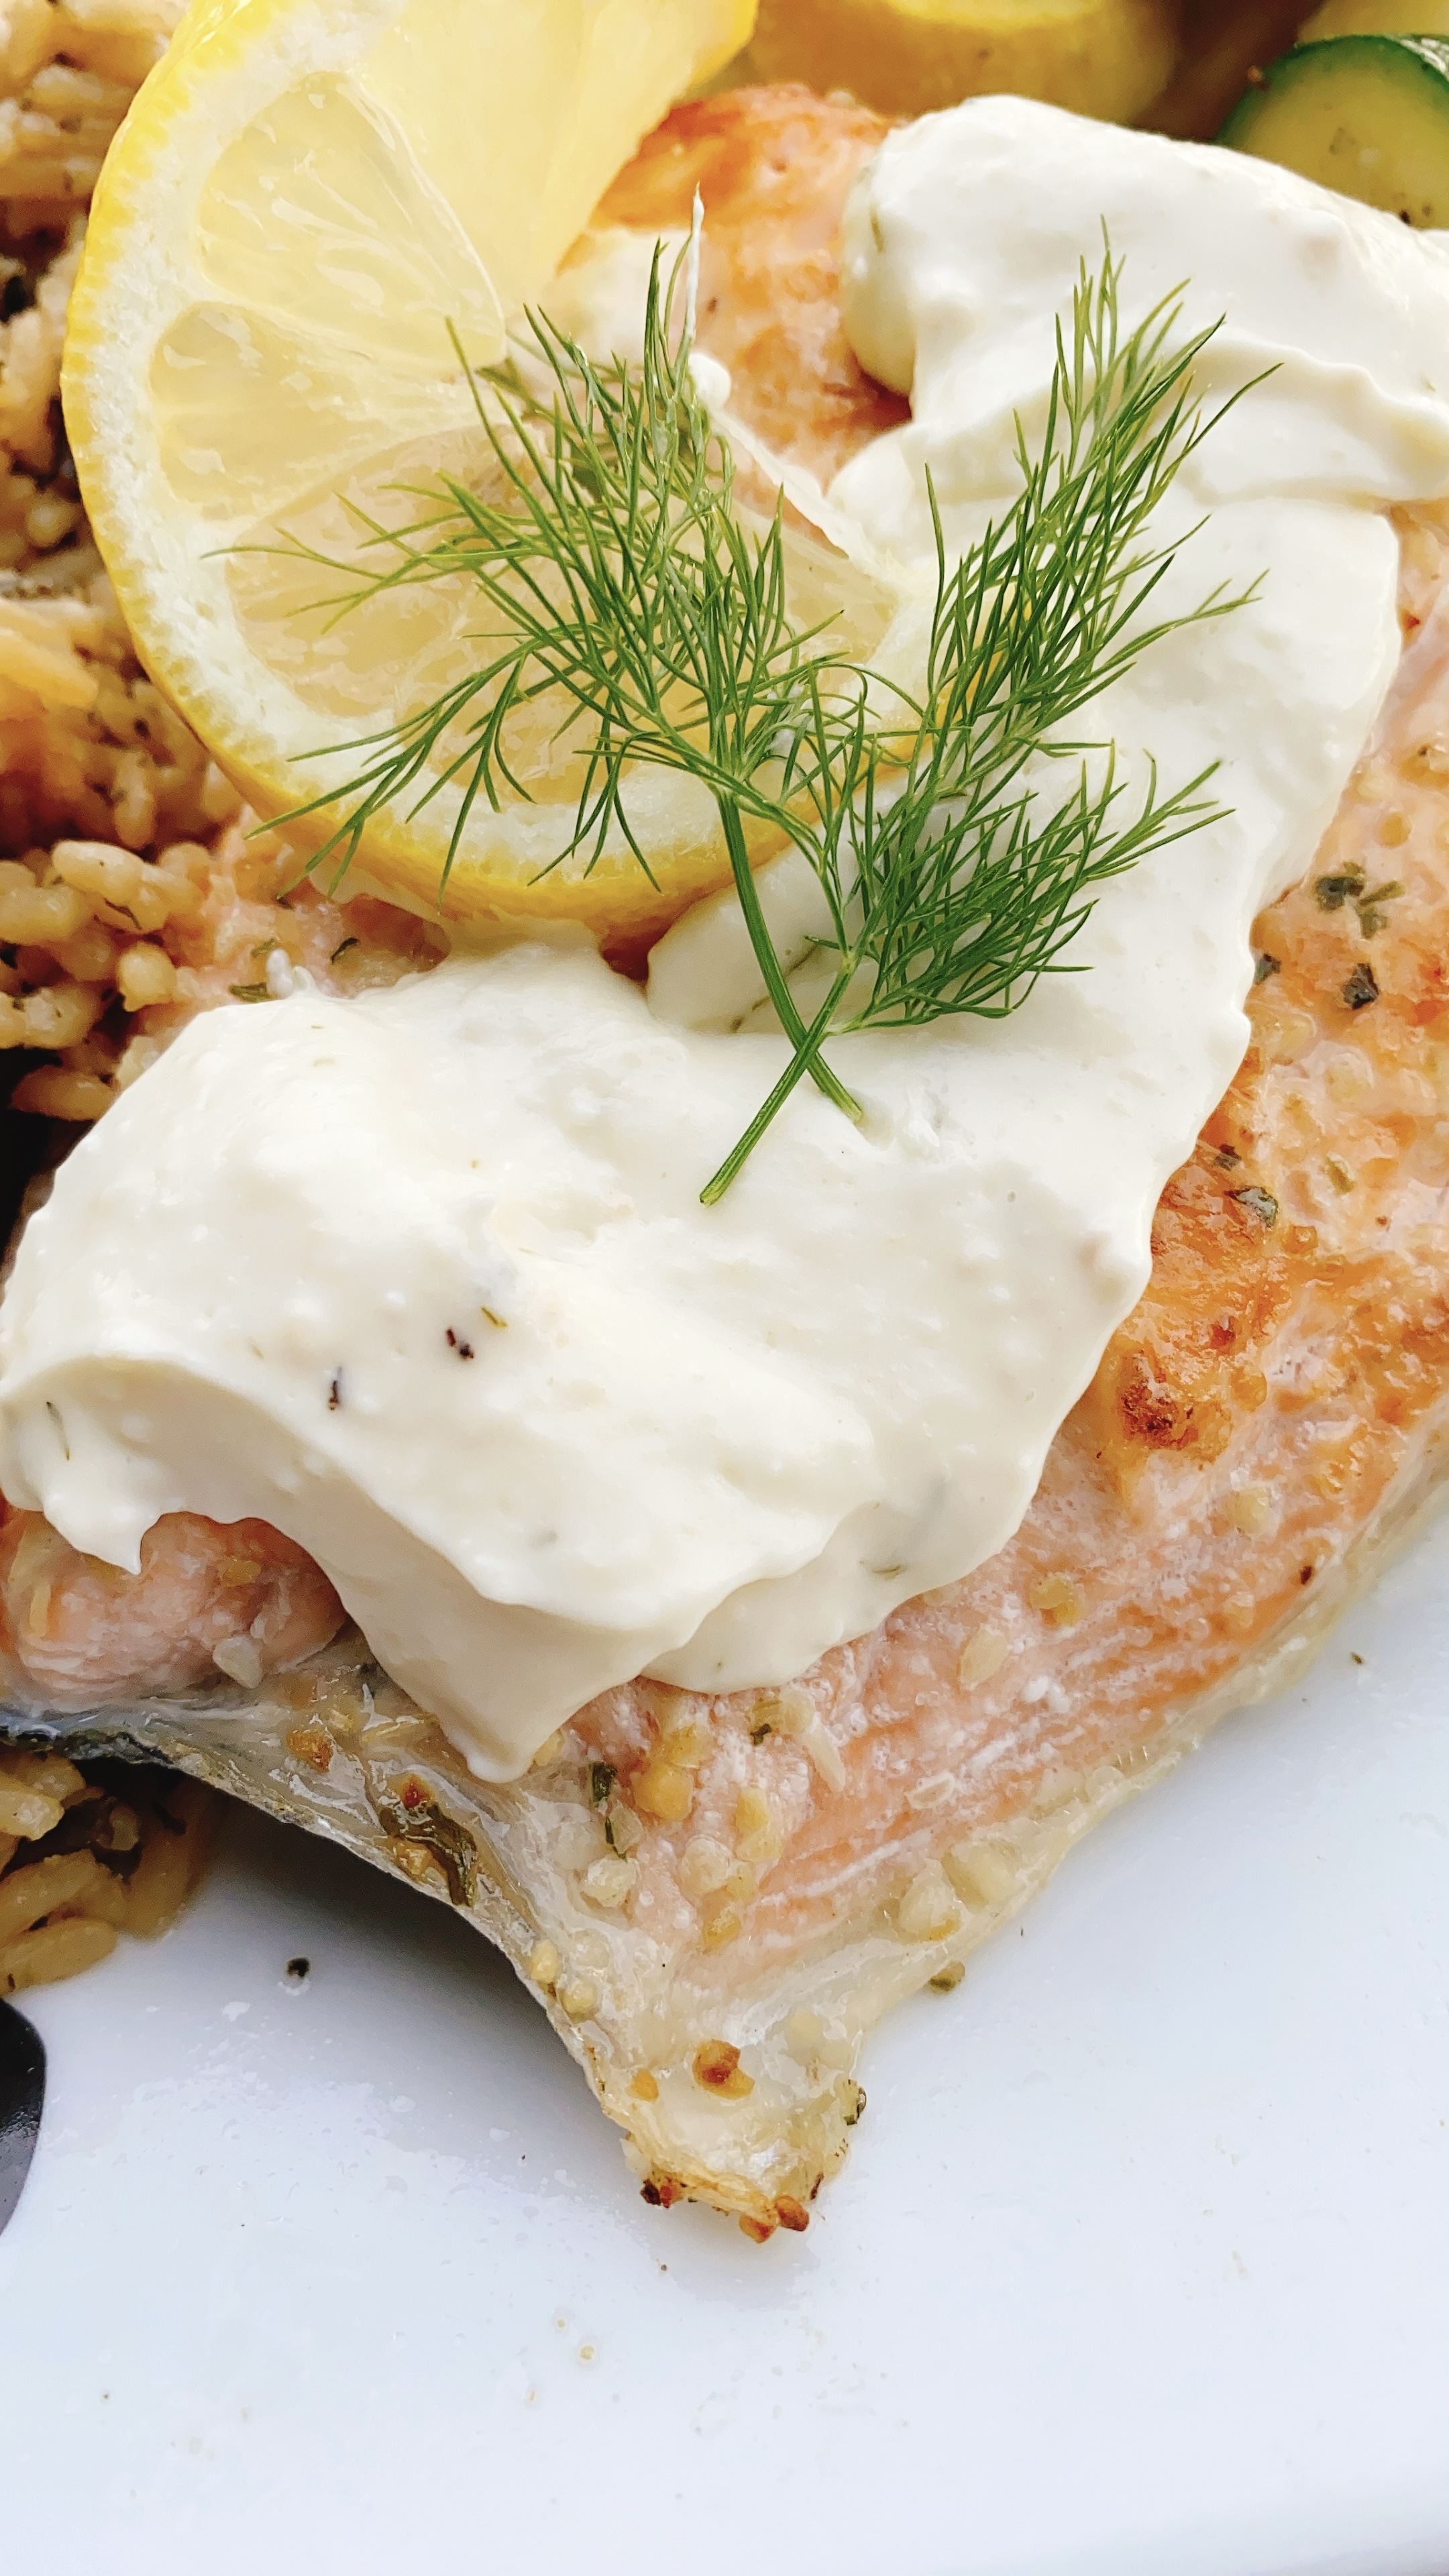 Lemon-Dill Sauce for Salmon